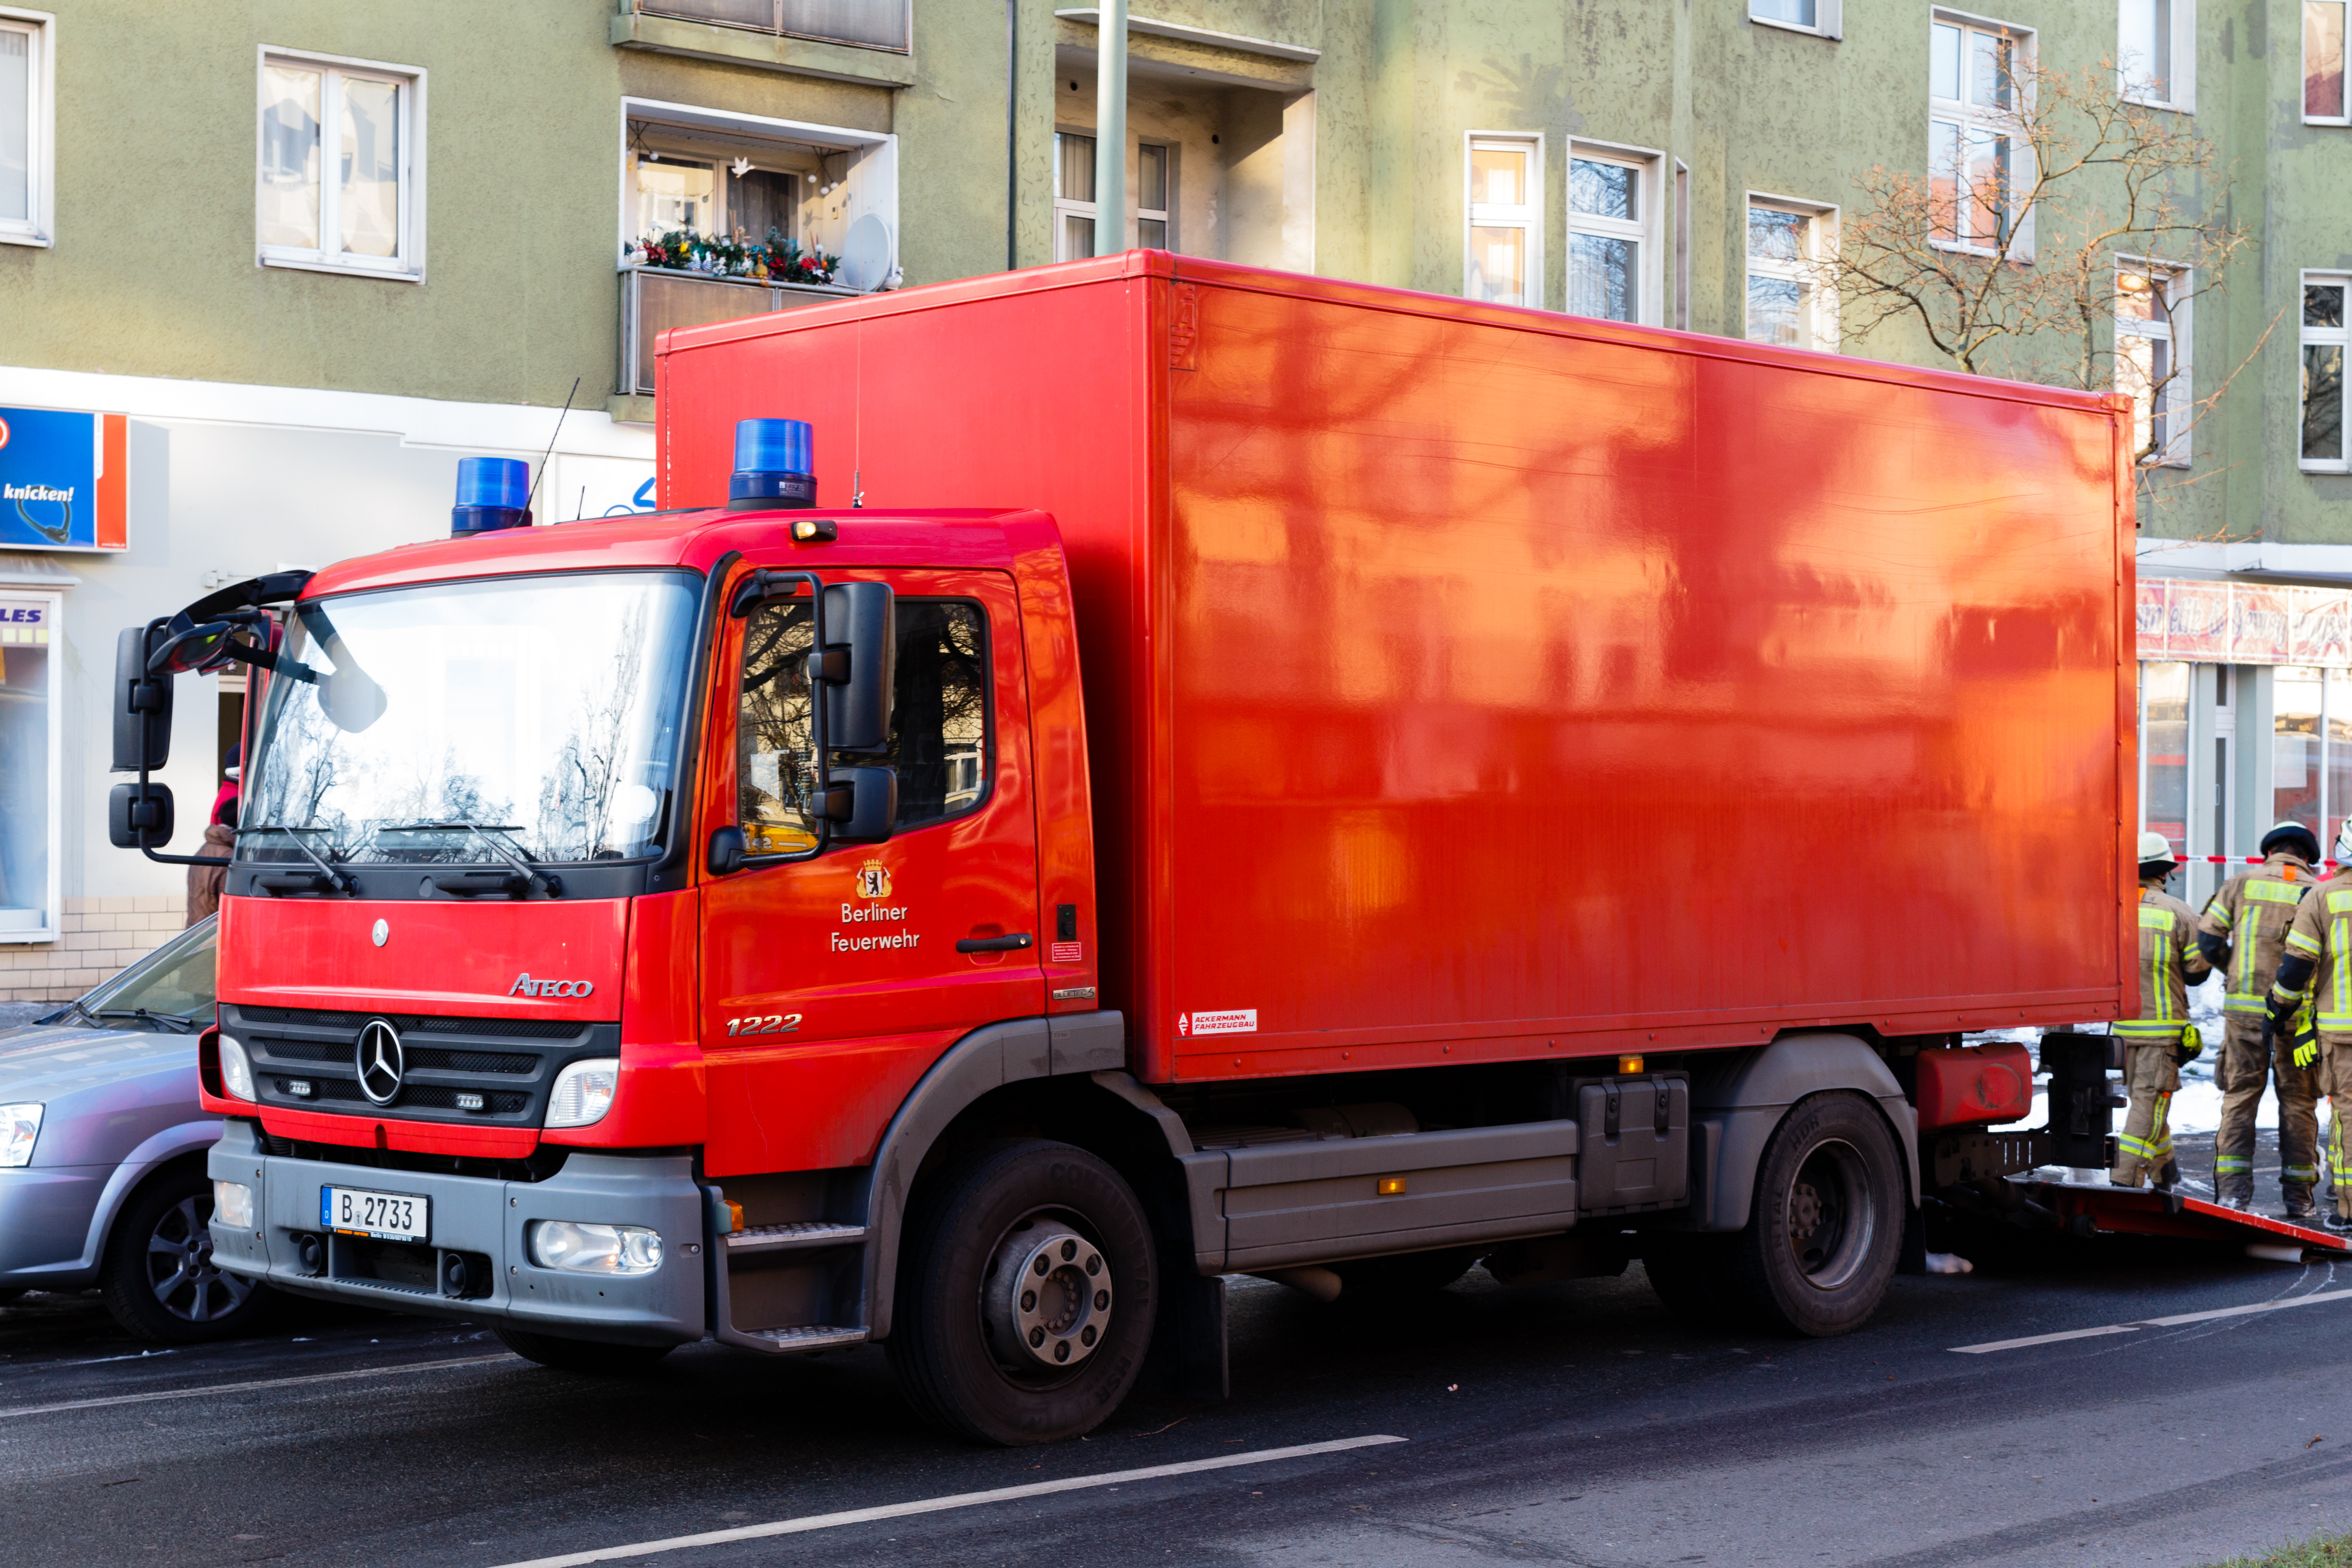 File:Dachstuhlbrand, Feuerwehr-LKW 20150101 4.jpg ...